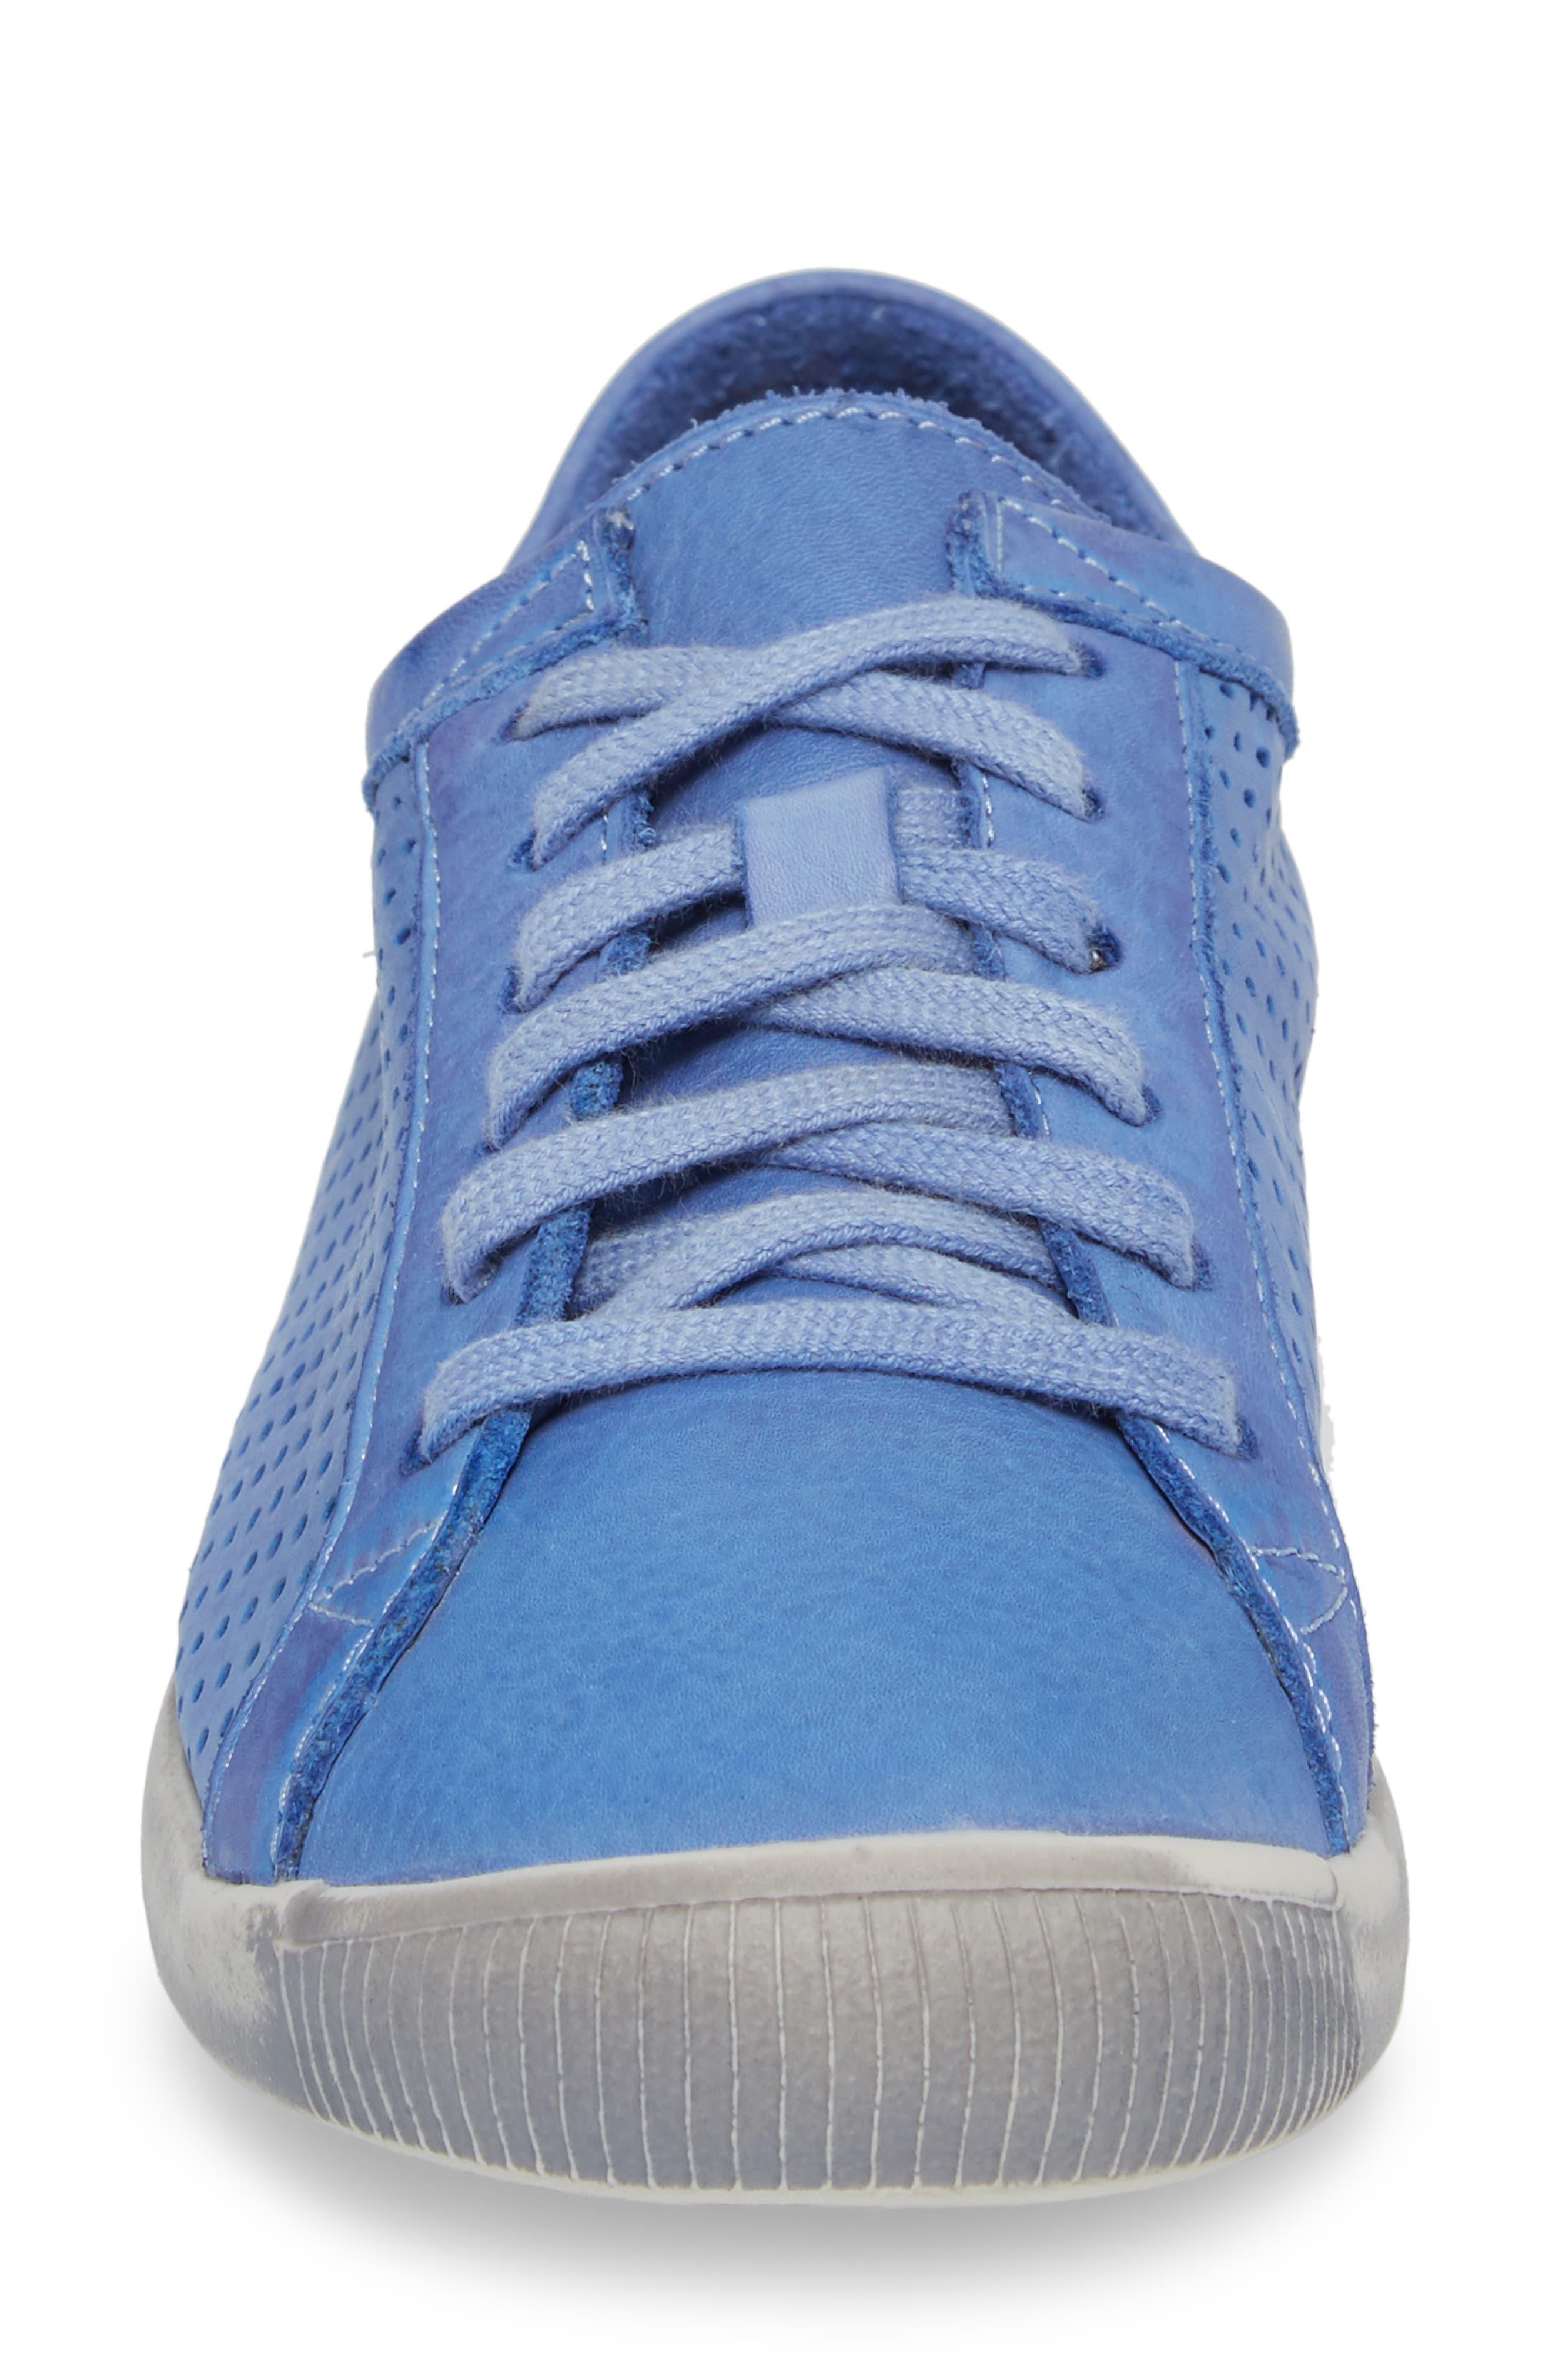 Ica Sneaker,                             Alternate thumbnail 27, color,